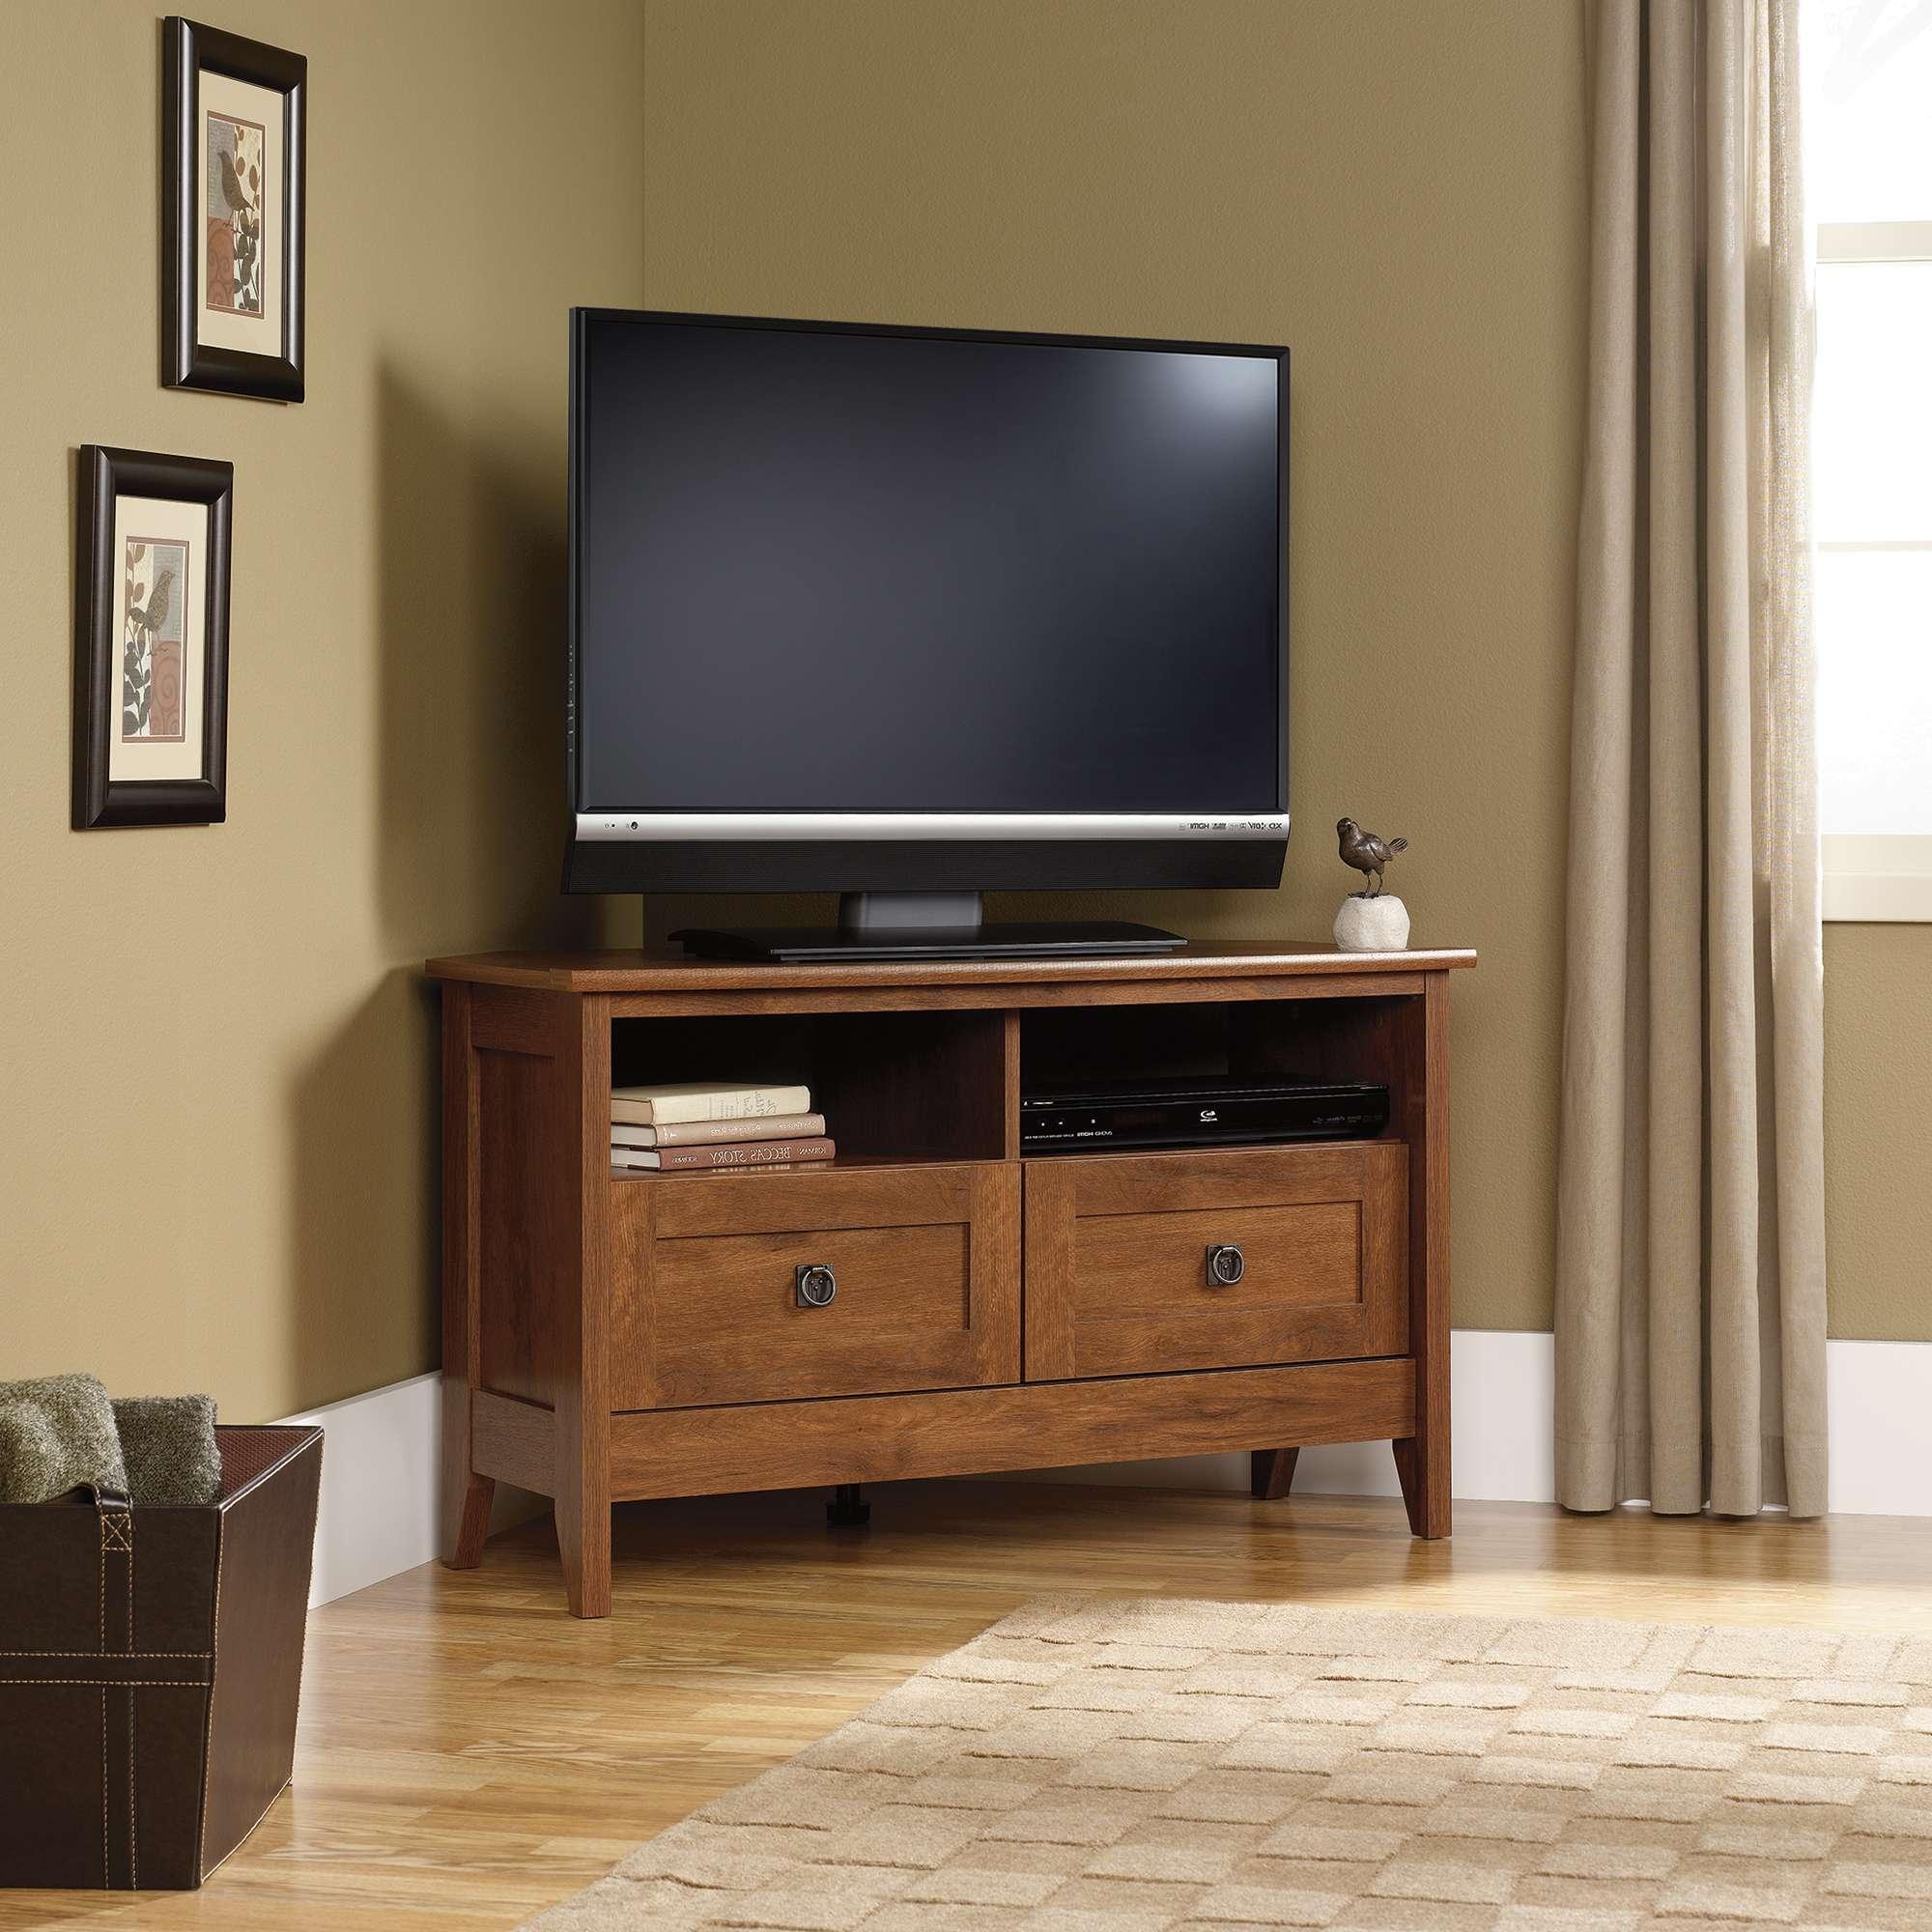 Sauder Select | Corner Tv Stand | 410627 | Sauder Regarding Corner Tv Stands With Drawers (View 10 of 15)